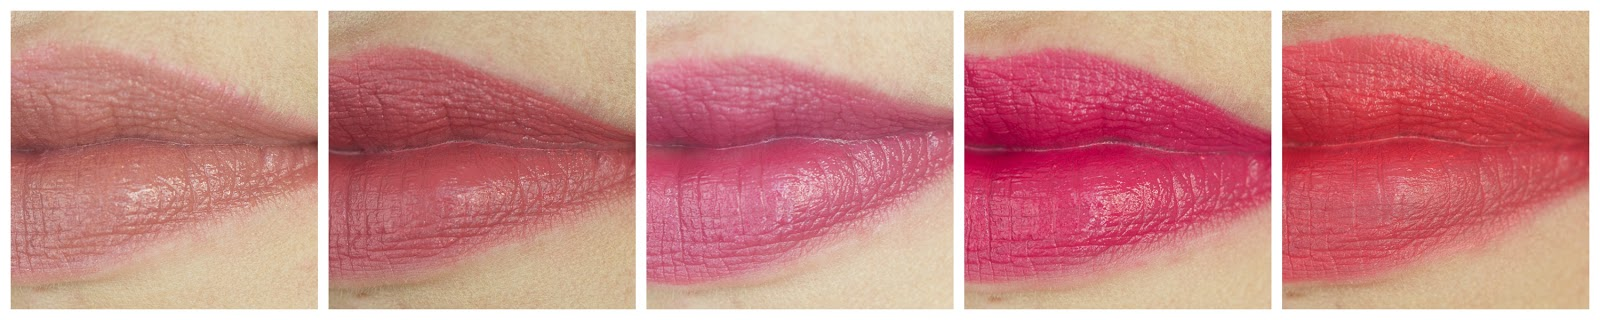 Lippenstiftzugänge MAC Giorgio Armani Estee Lauder